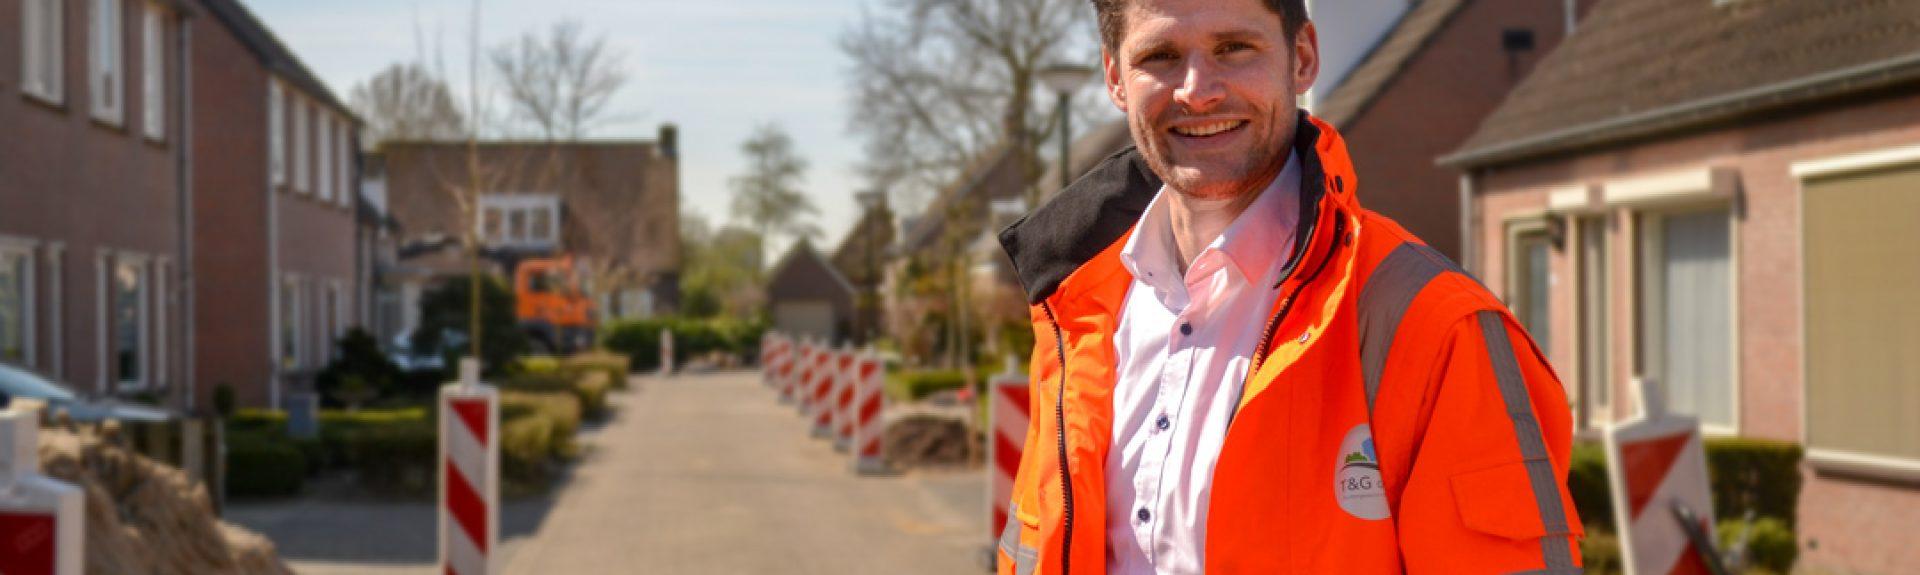 Frank Bankers Liempde - T&G Groep - web